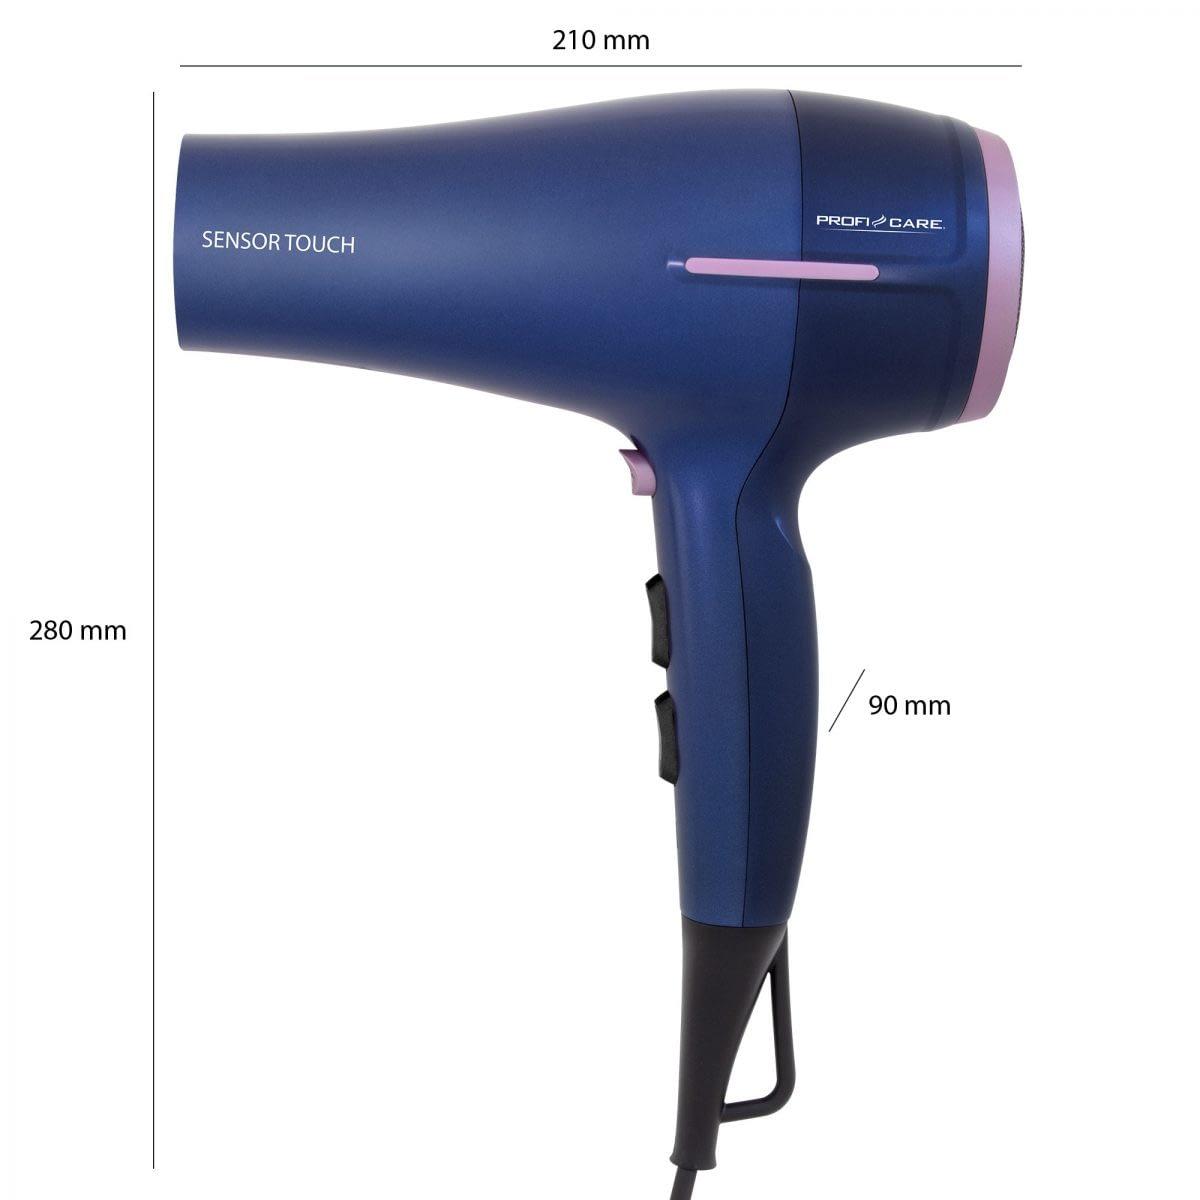 Secador de cabelo HTD 3030